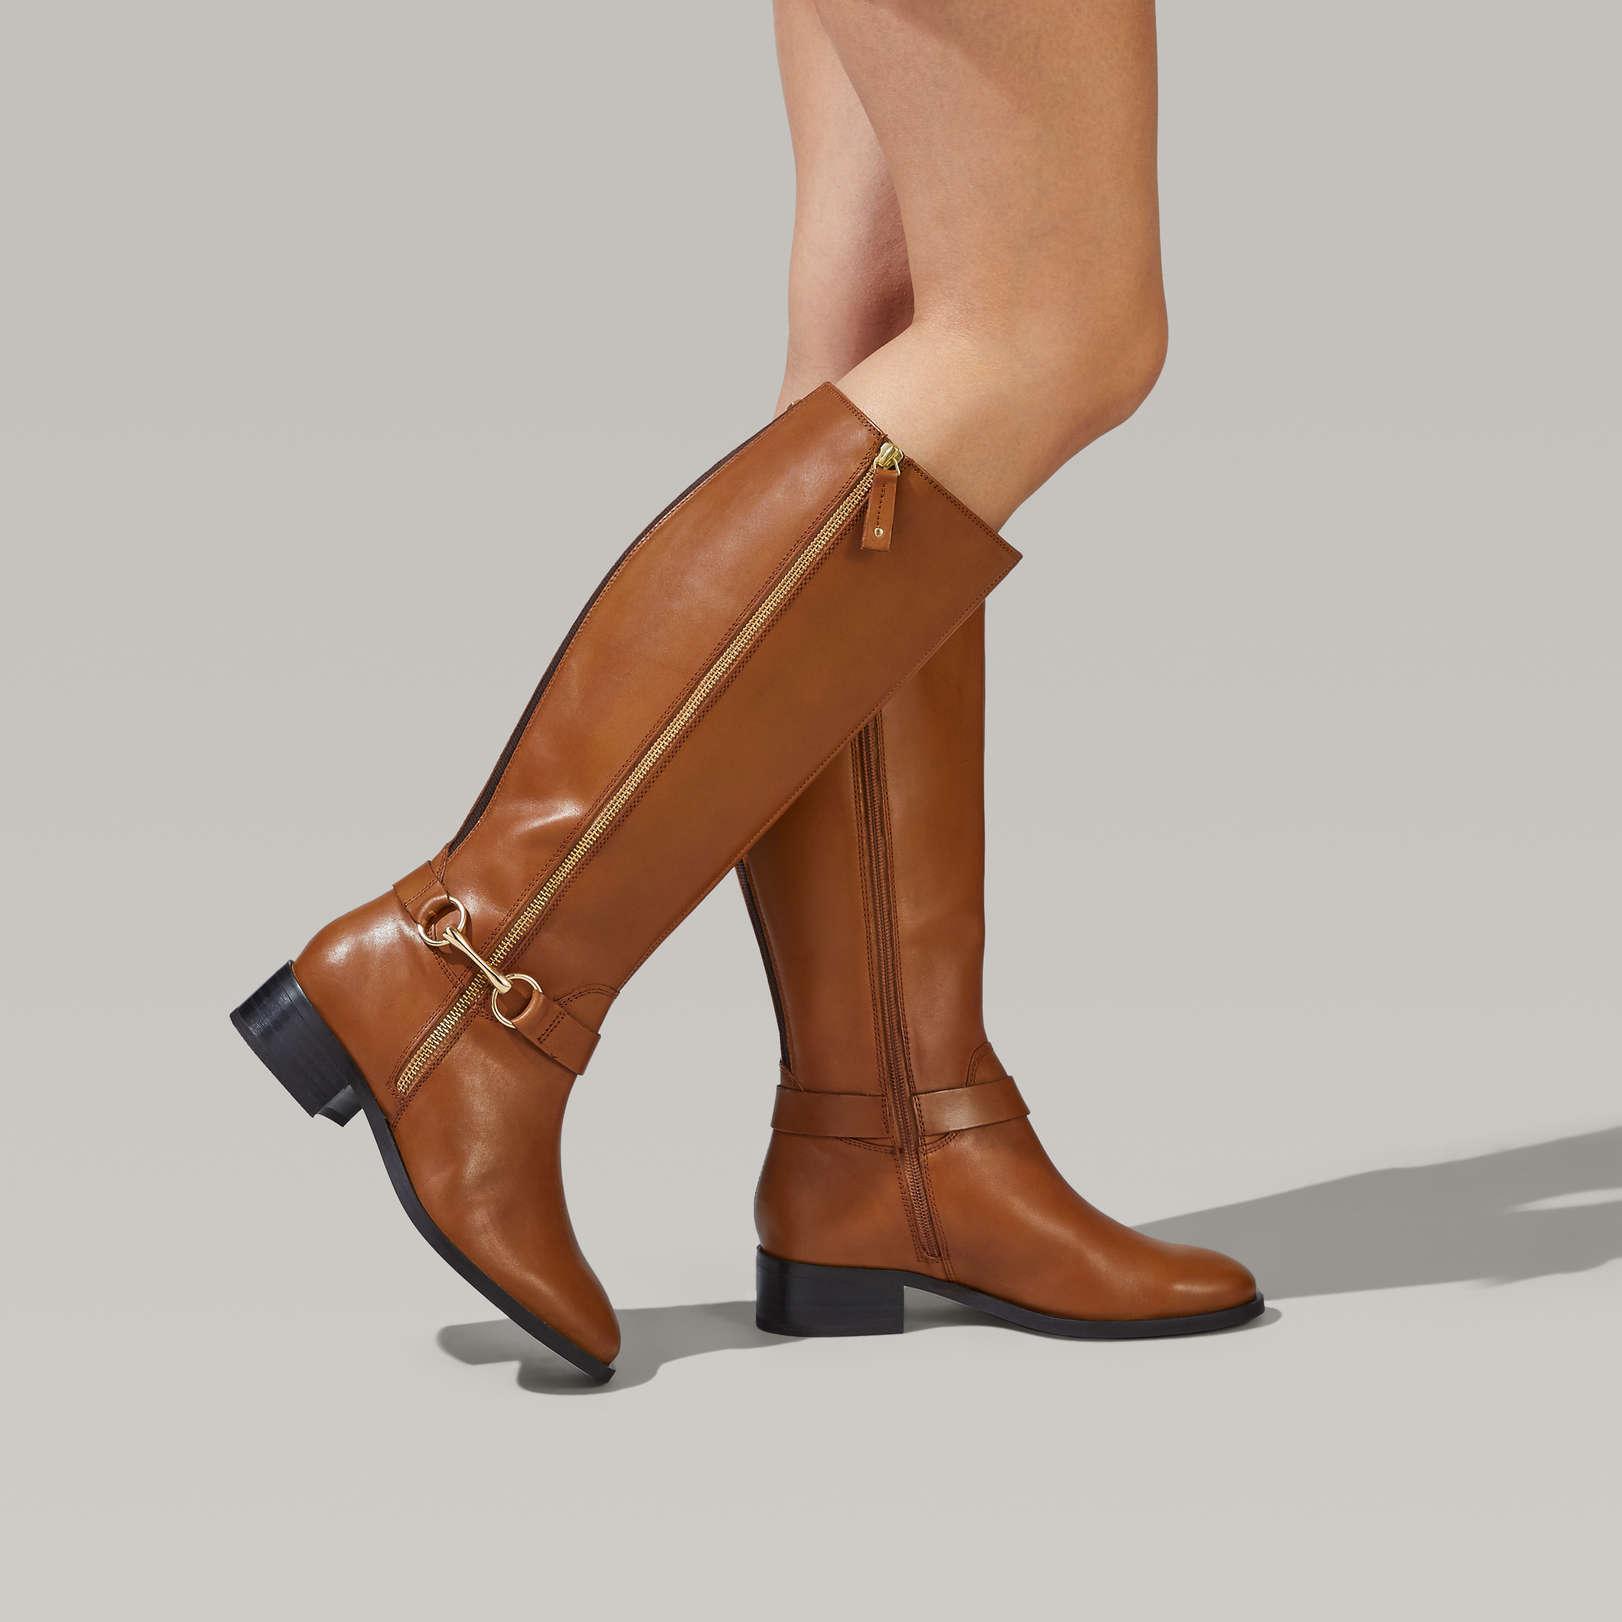 WAFFLES - CARVELA High Leg Boots